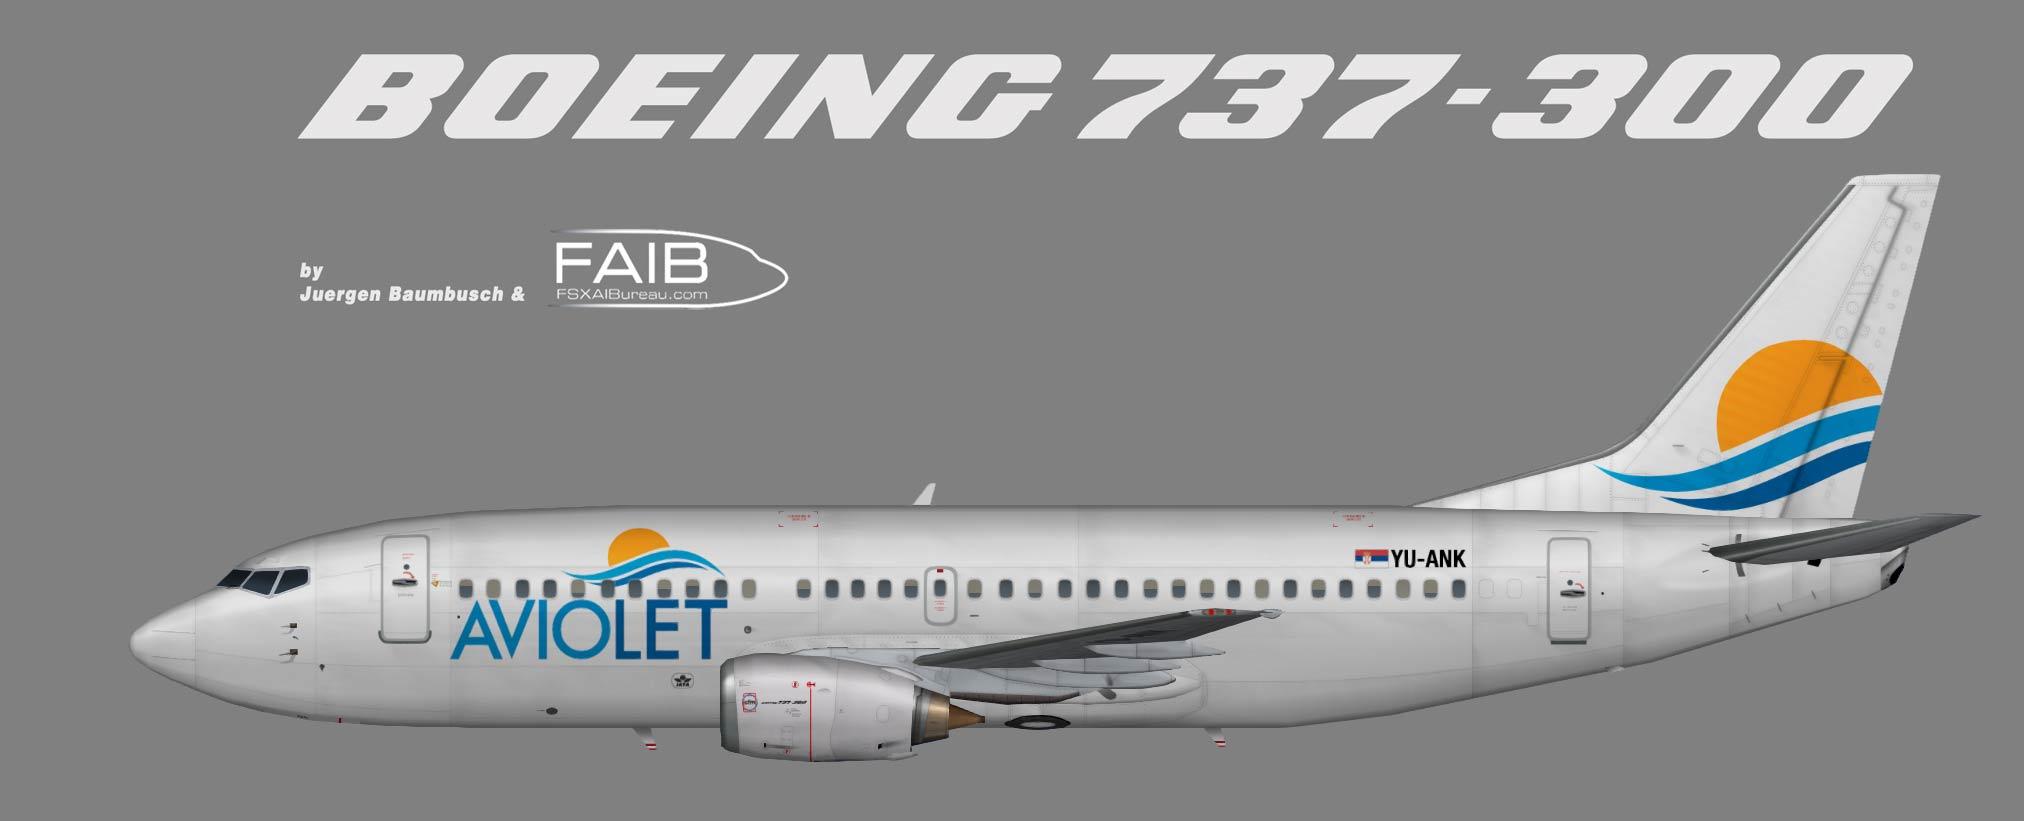 Aviolet Boeing 737-300